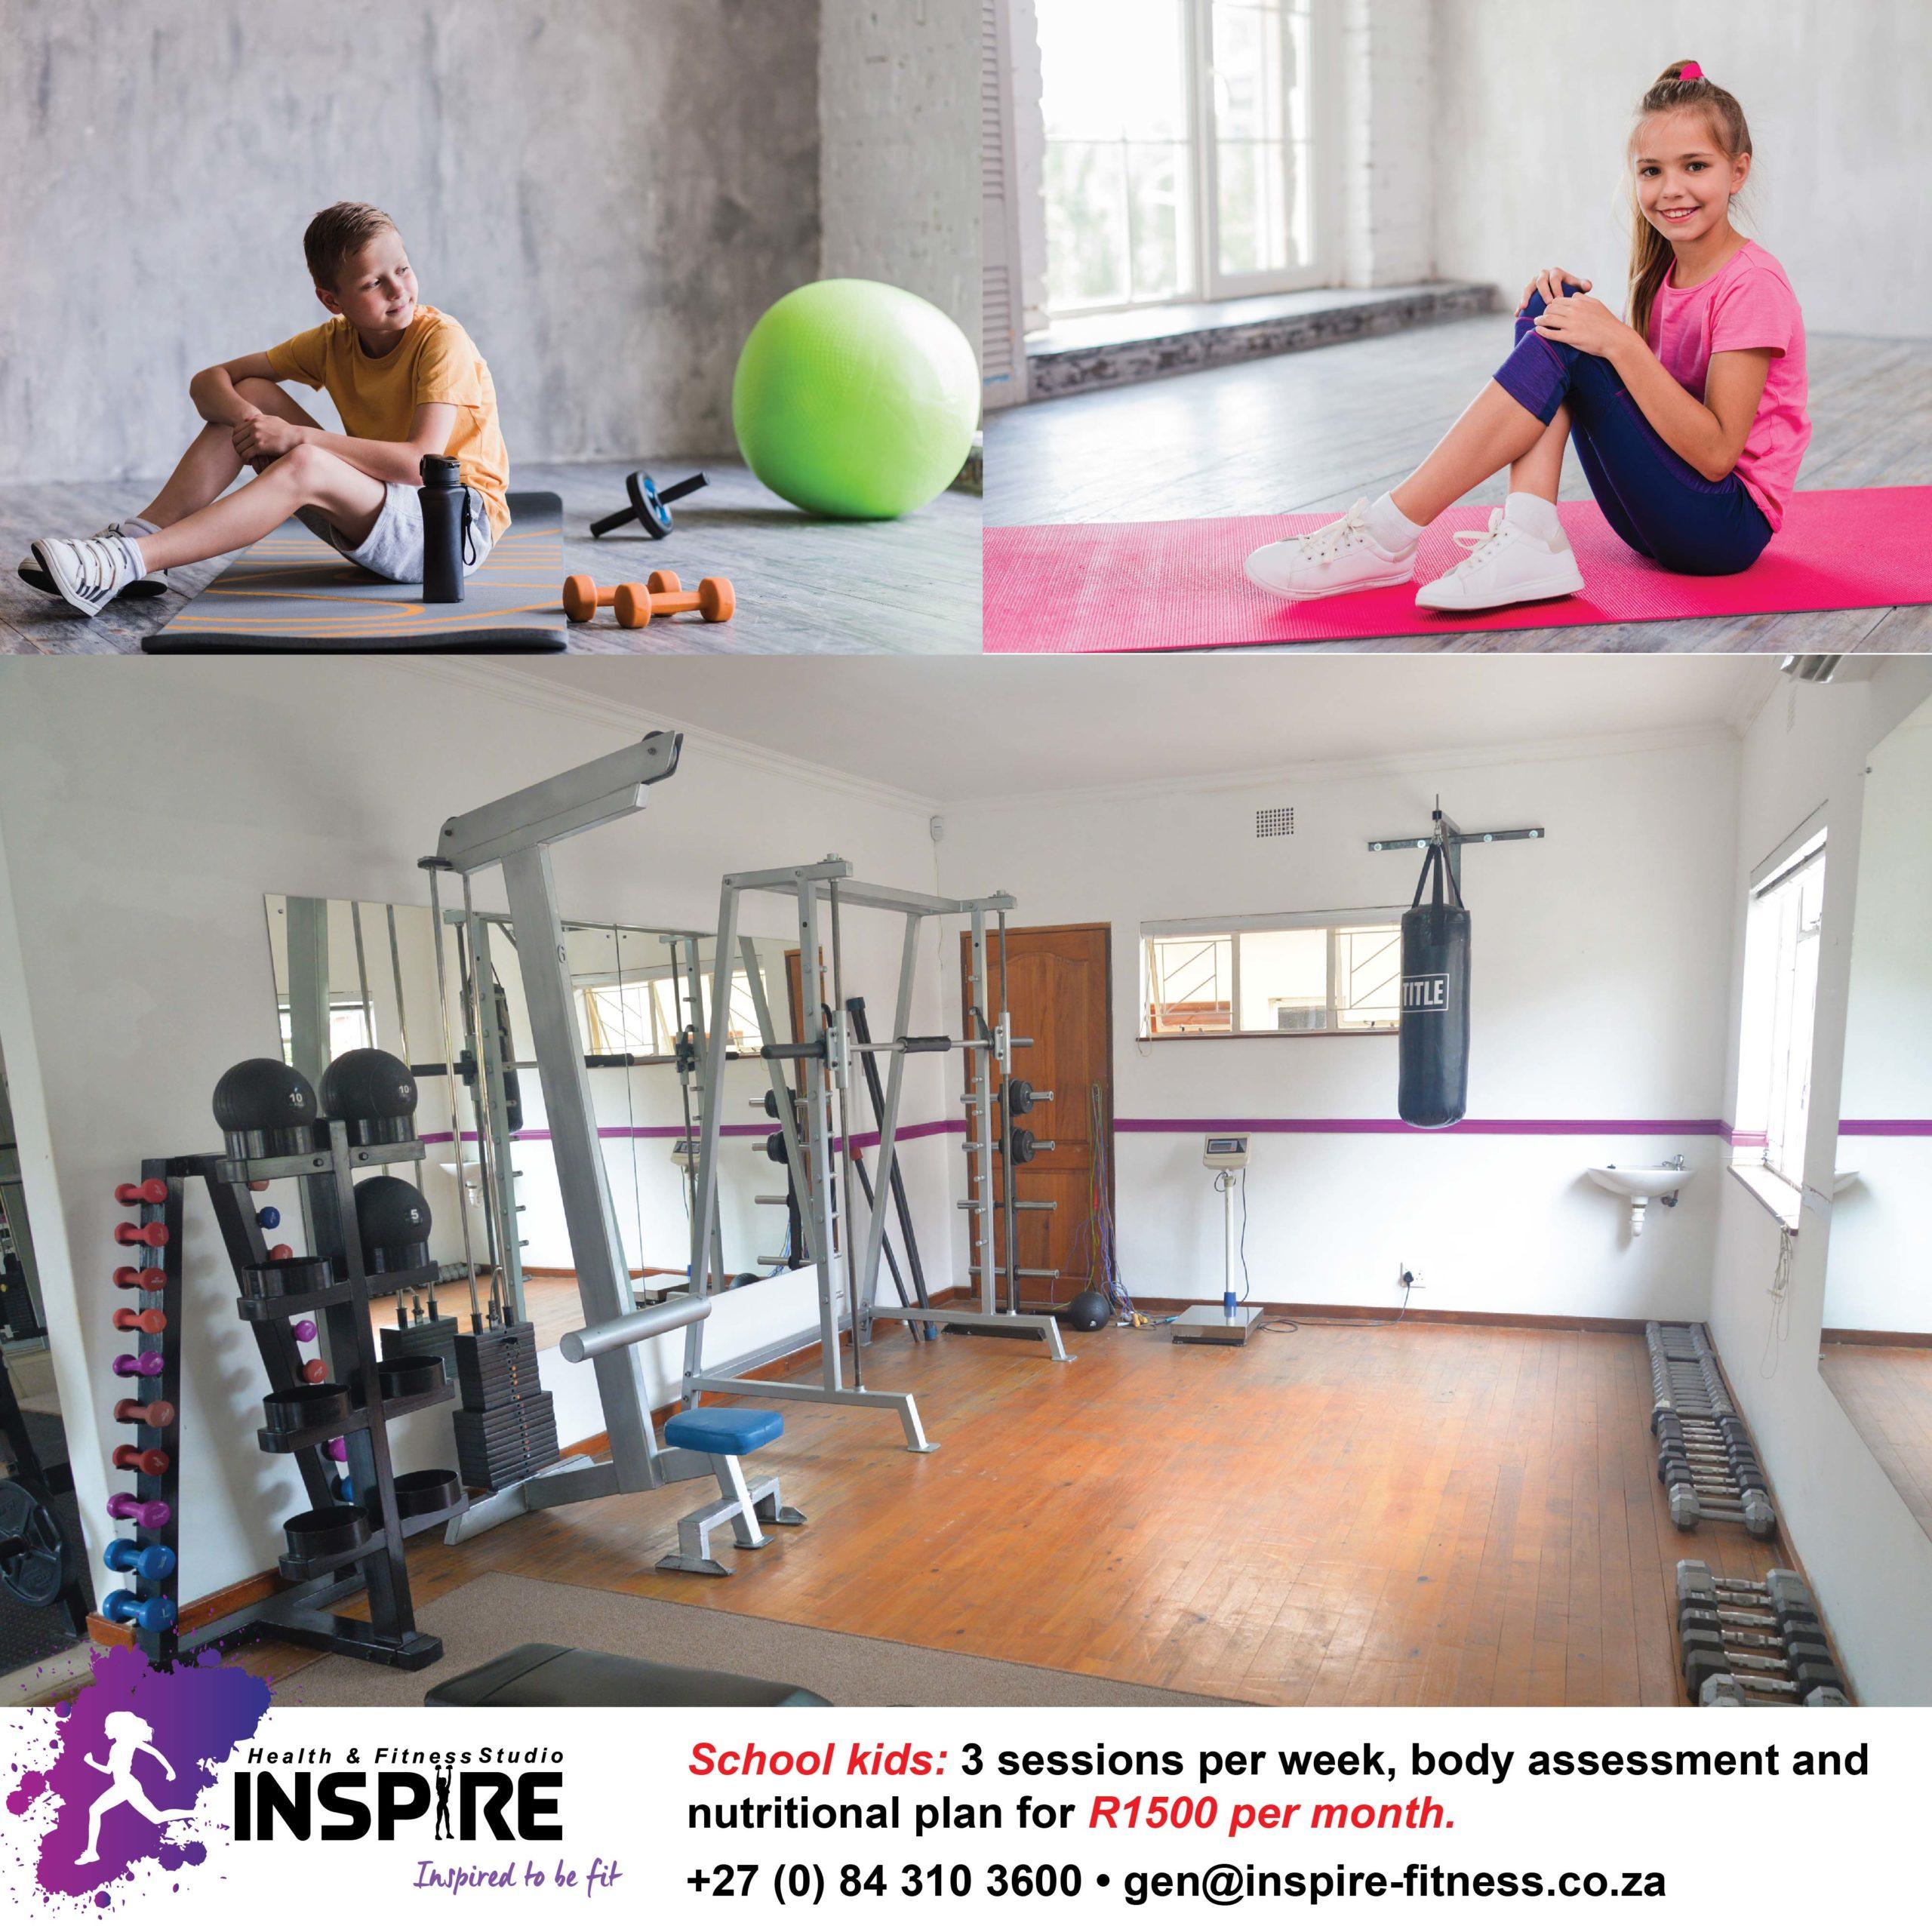 School Kids Special Inspire Fitness www.inspire-fitness.co.za